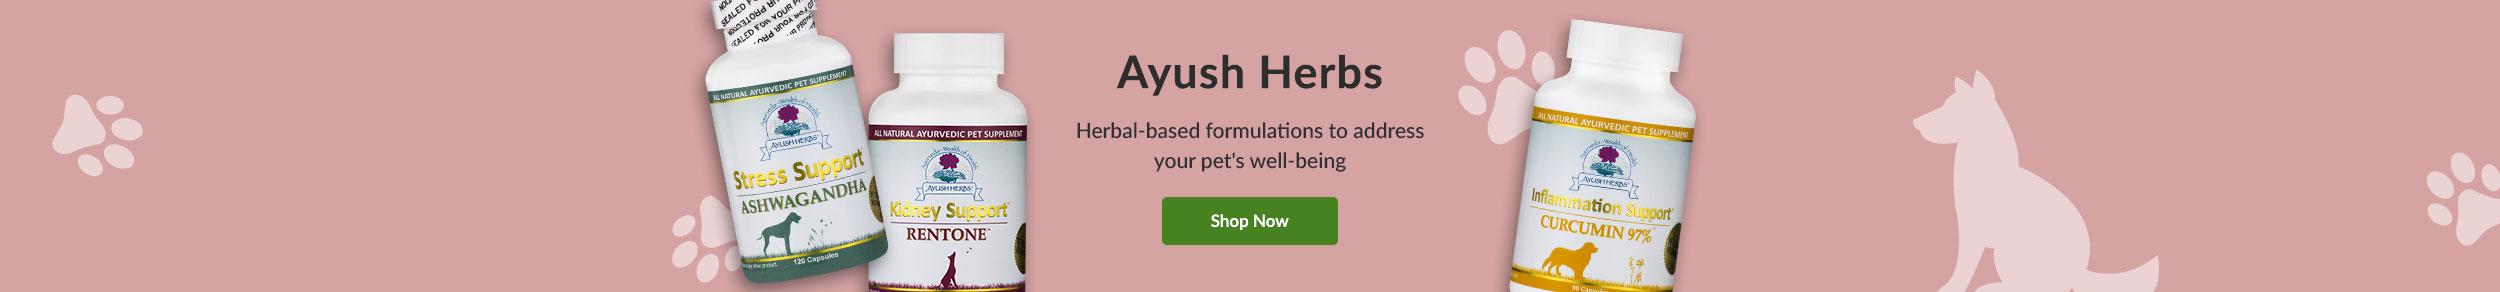 https://i3.pureformulas.net/images/static/Brand_Spotlight_Ayush_Herbs_122818.jpg